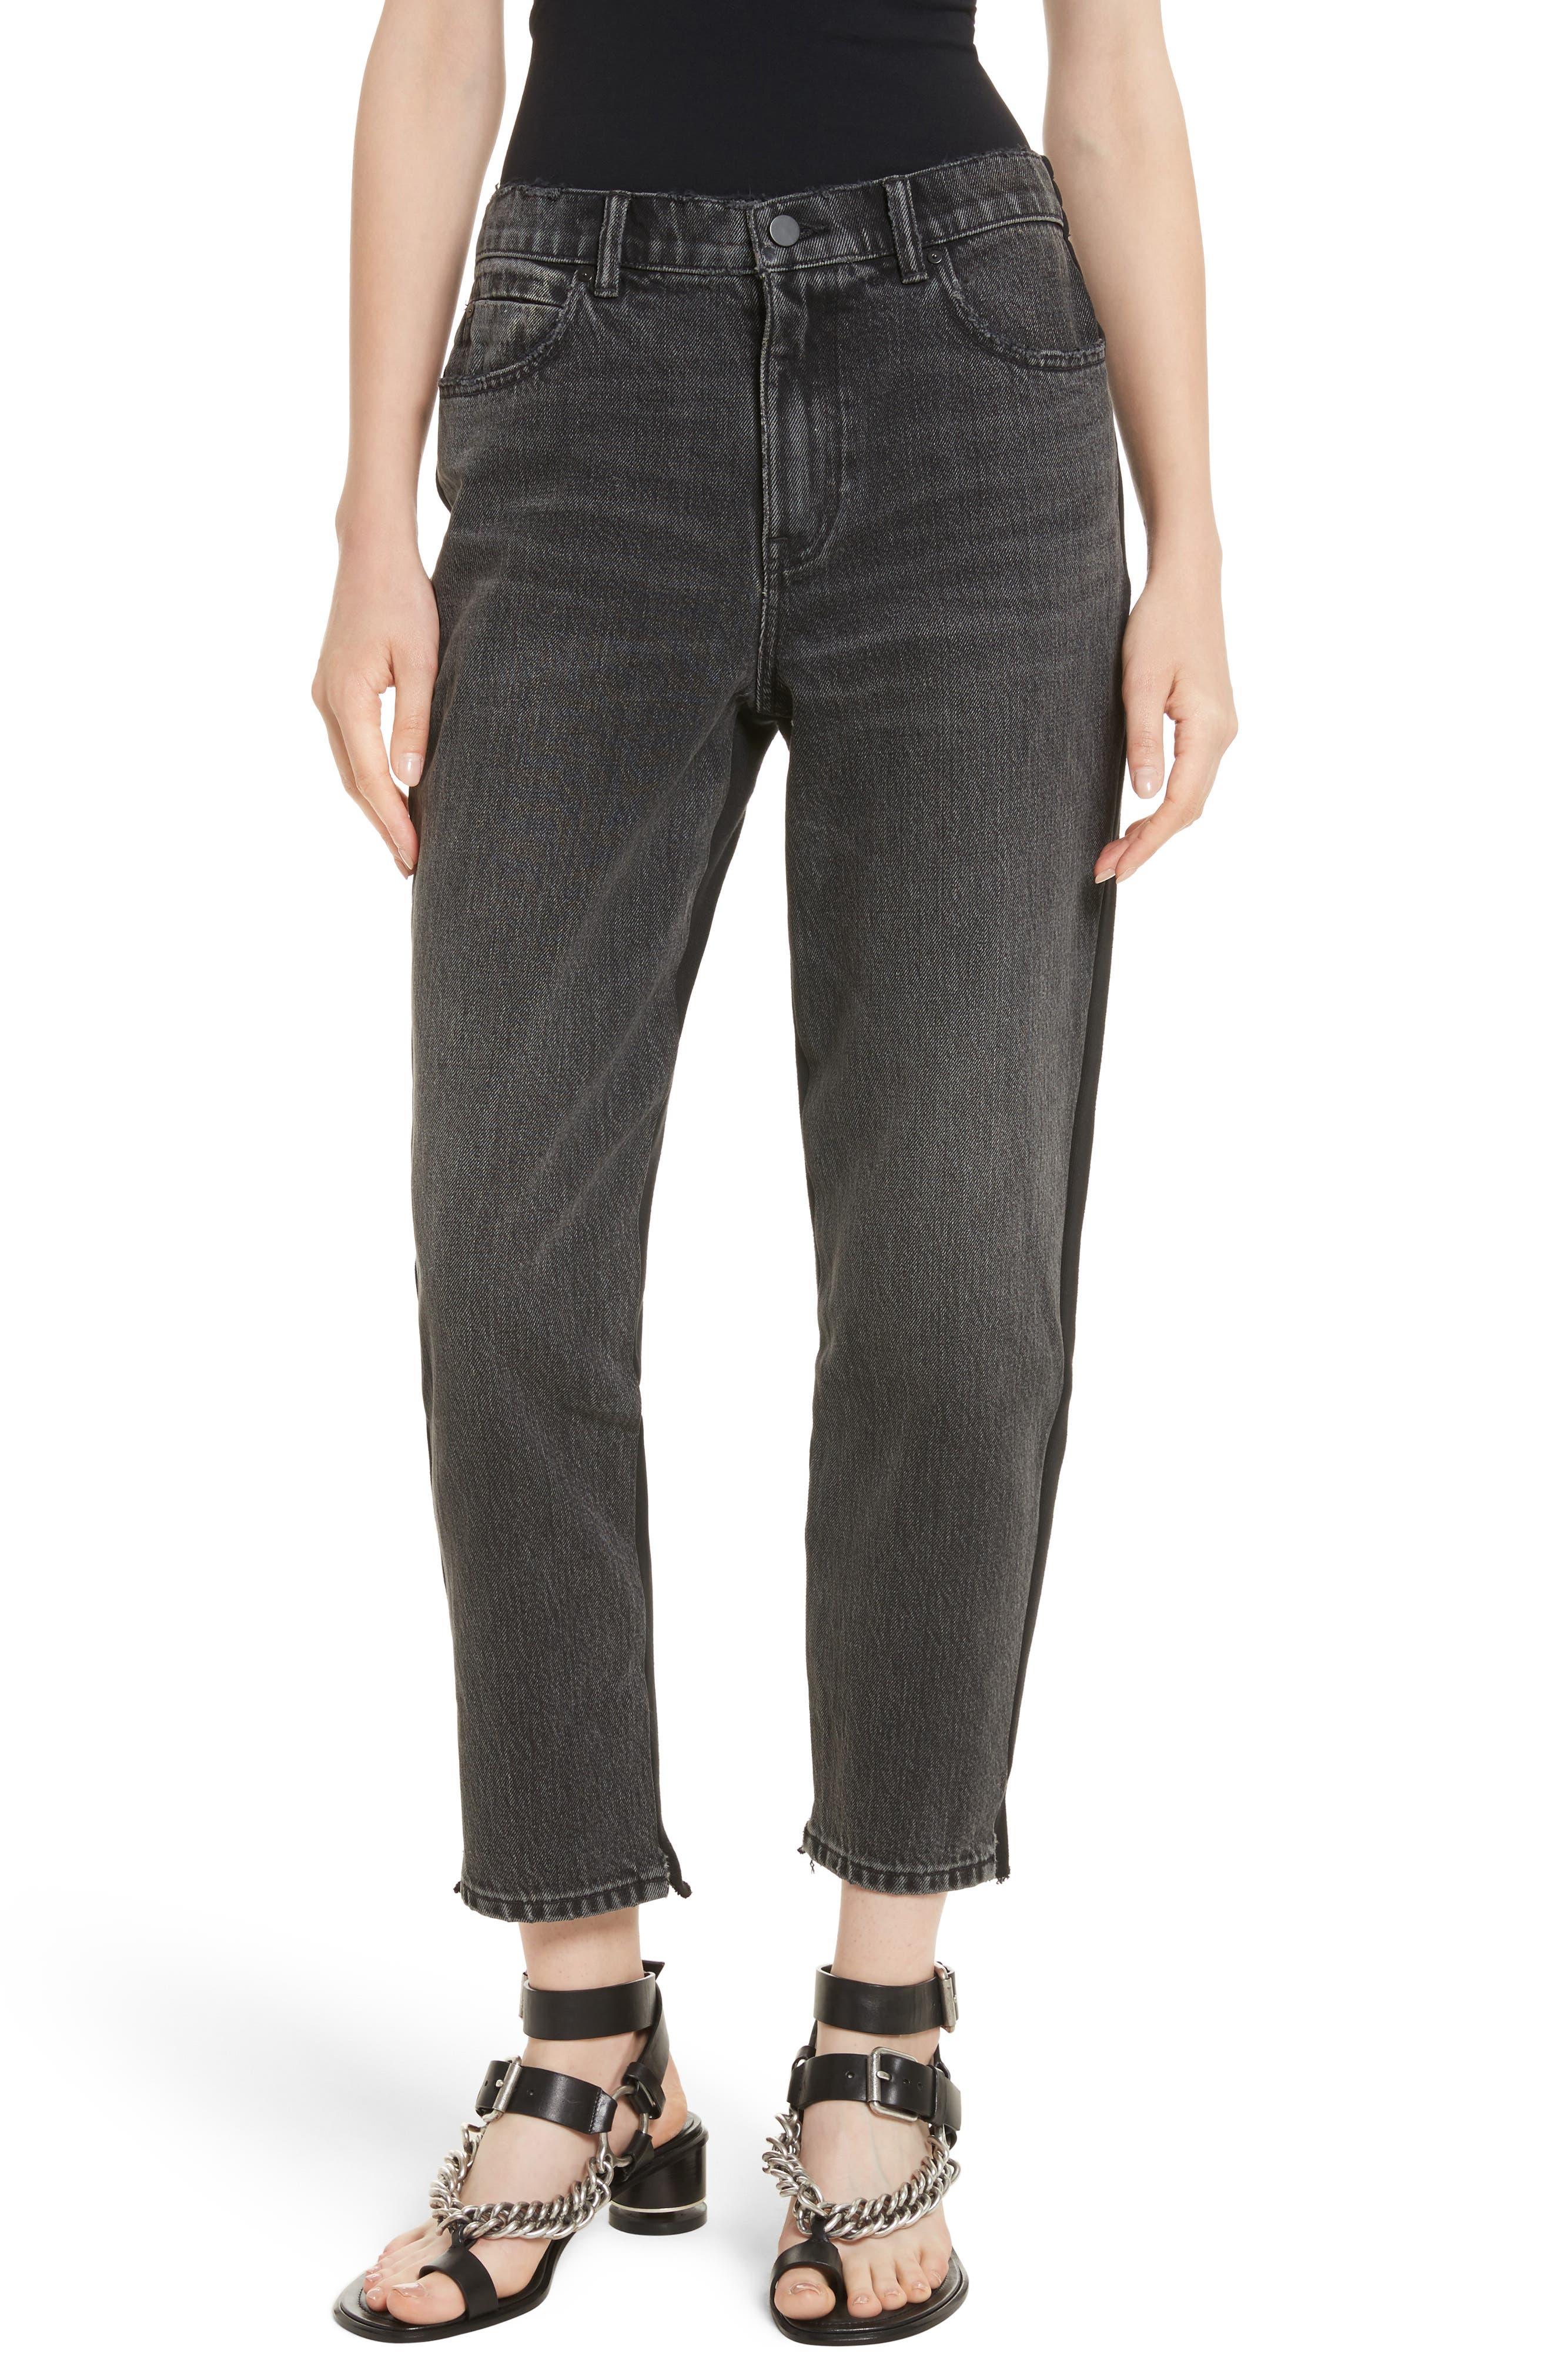 Denim x Alexander Wang Hybrid Sweatpants Jeans,                         Main,                         color, 025